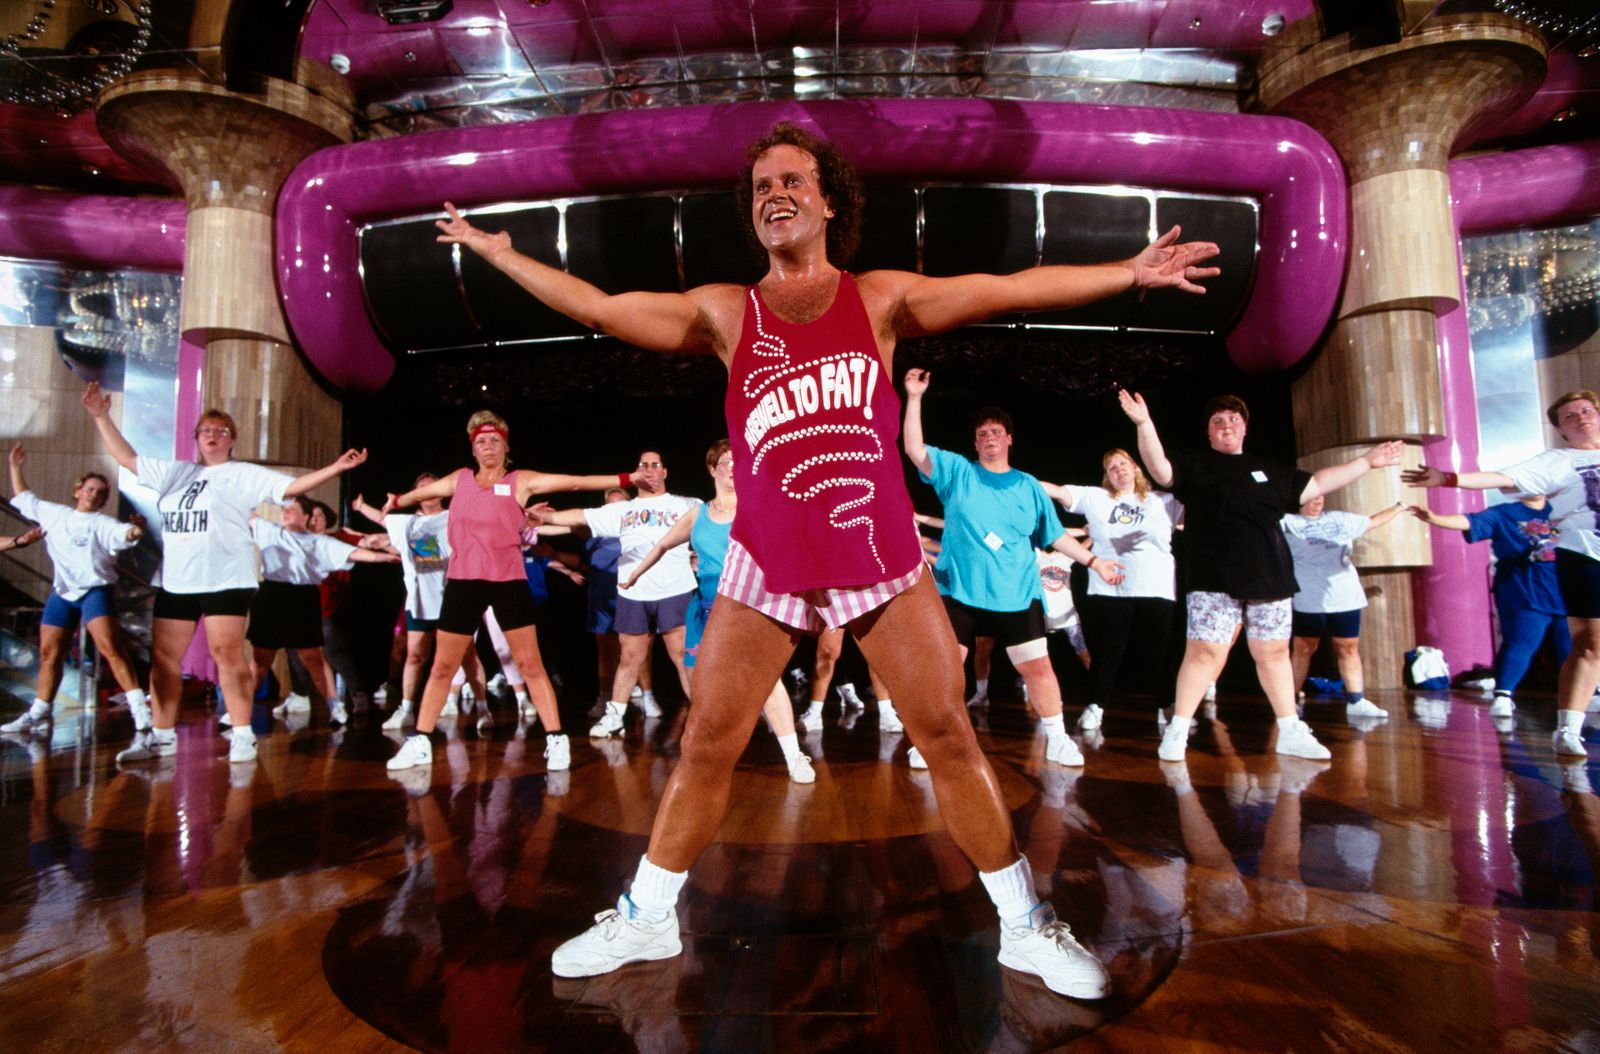 American fitness coach Richard Simmons